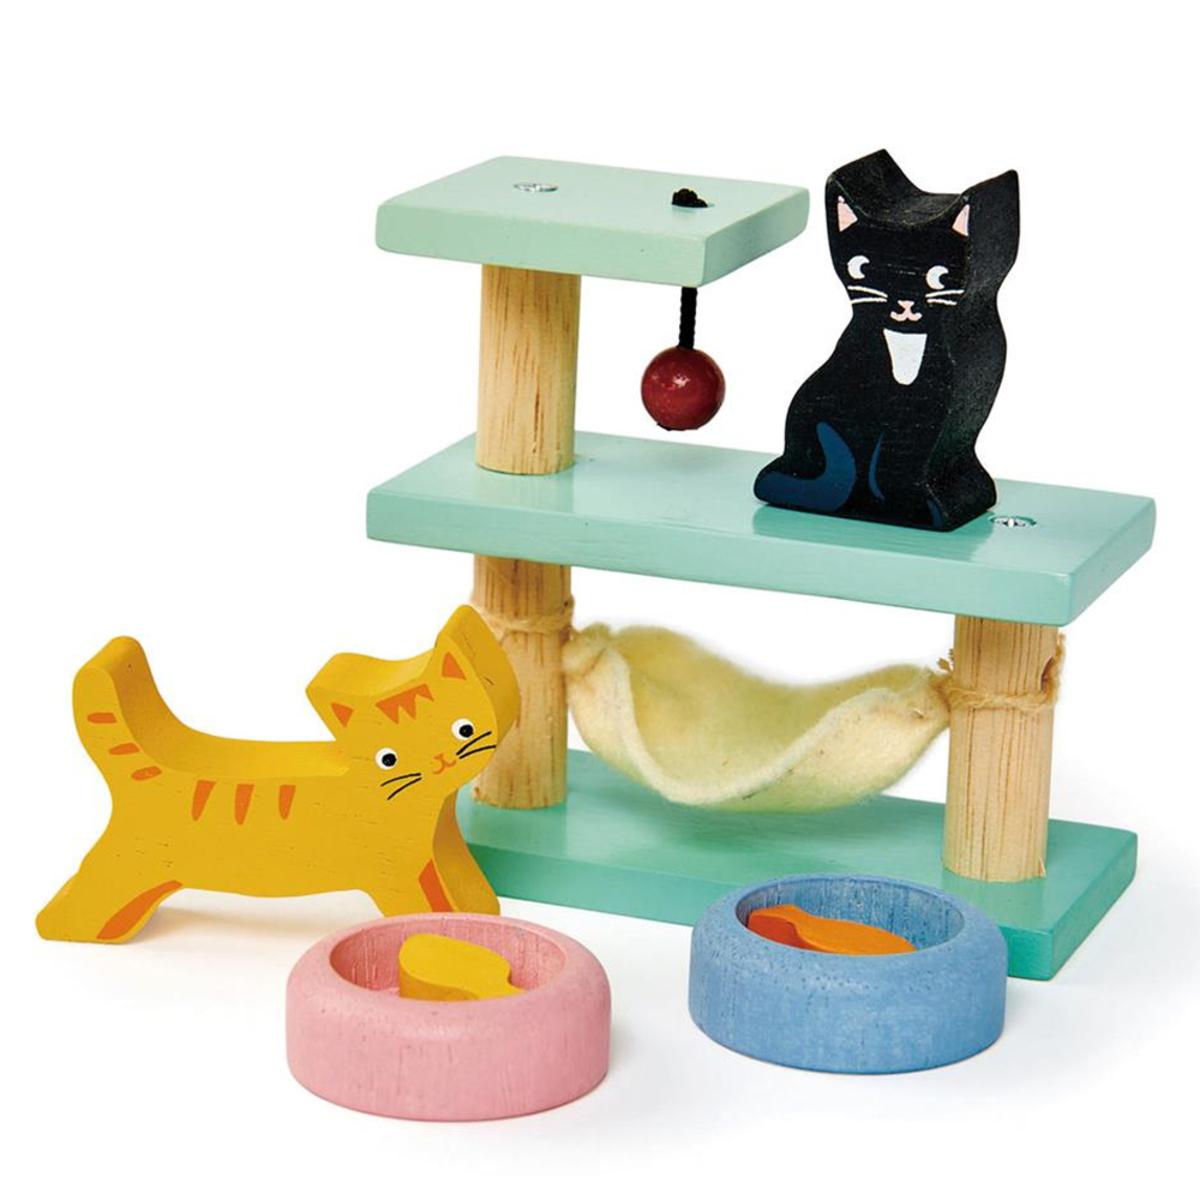 Mes premiers jouets Set Animaux Domestiques Chats Tender Leaf Toys - AR202001280101